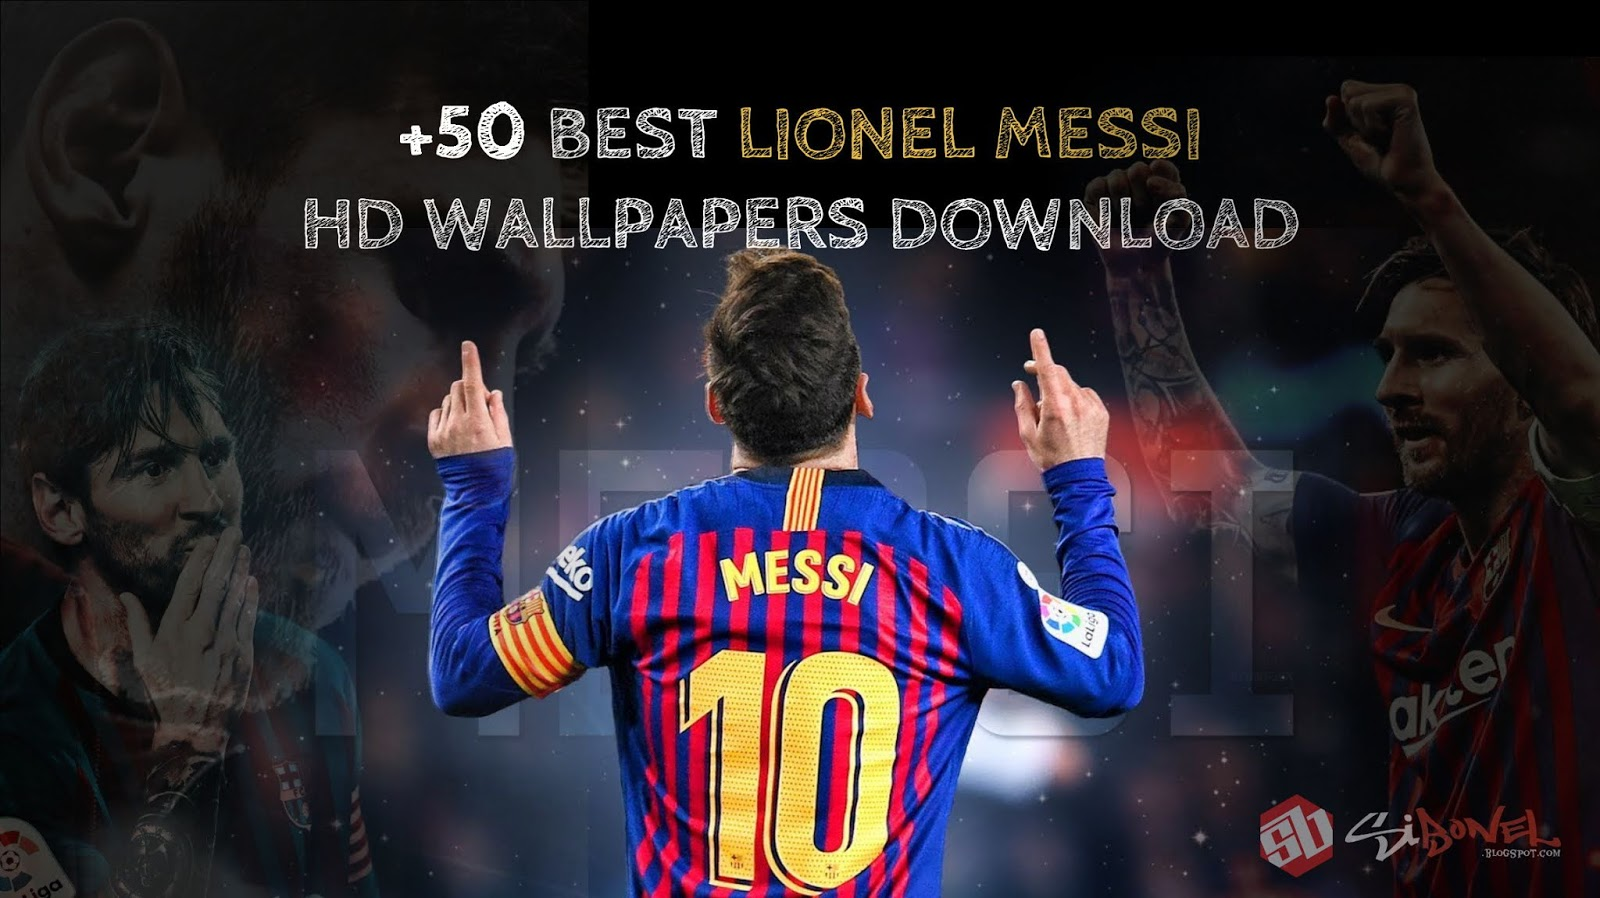 Lionel Messi Wallpaper 2020